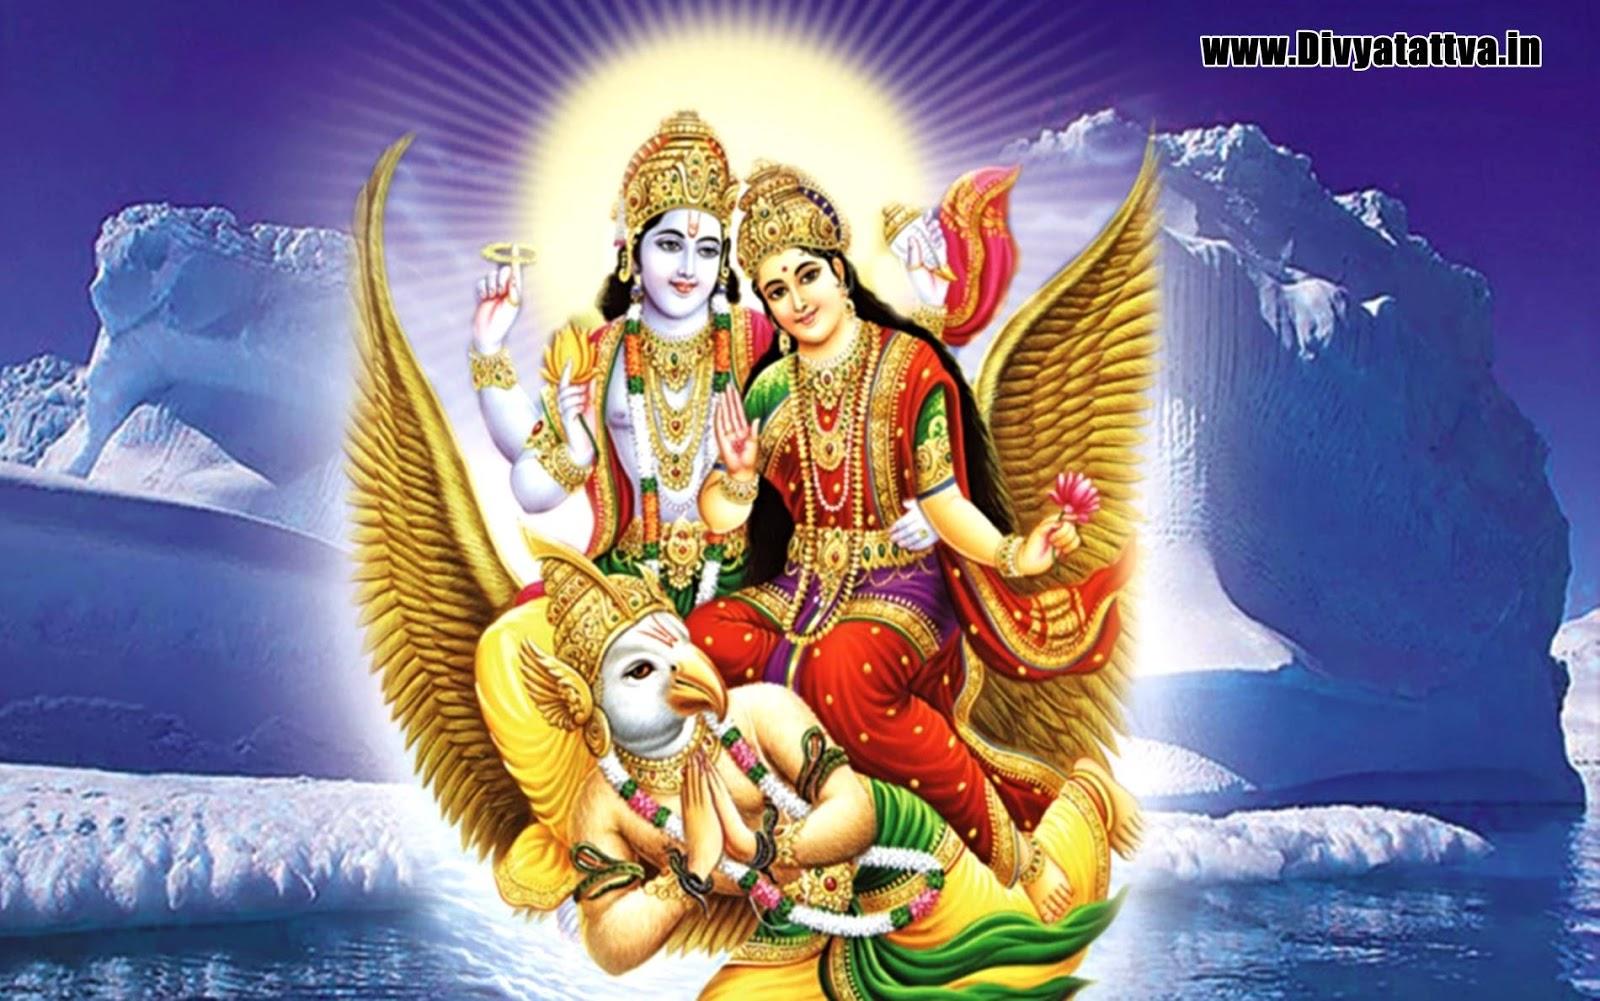 Fantastic Wallpaper Lord Mahavishnu - Lord-Vishnu-and-Mata-Lakshmi-Wallpapers-garuda-hindu-gods-www  You Should Have_594635.jpg